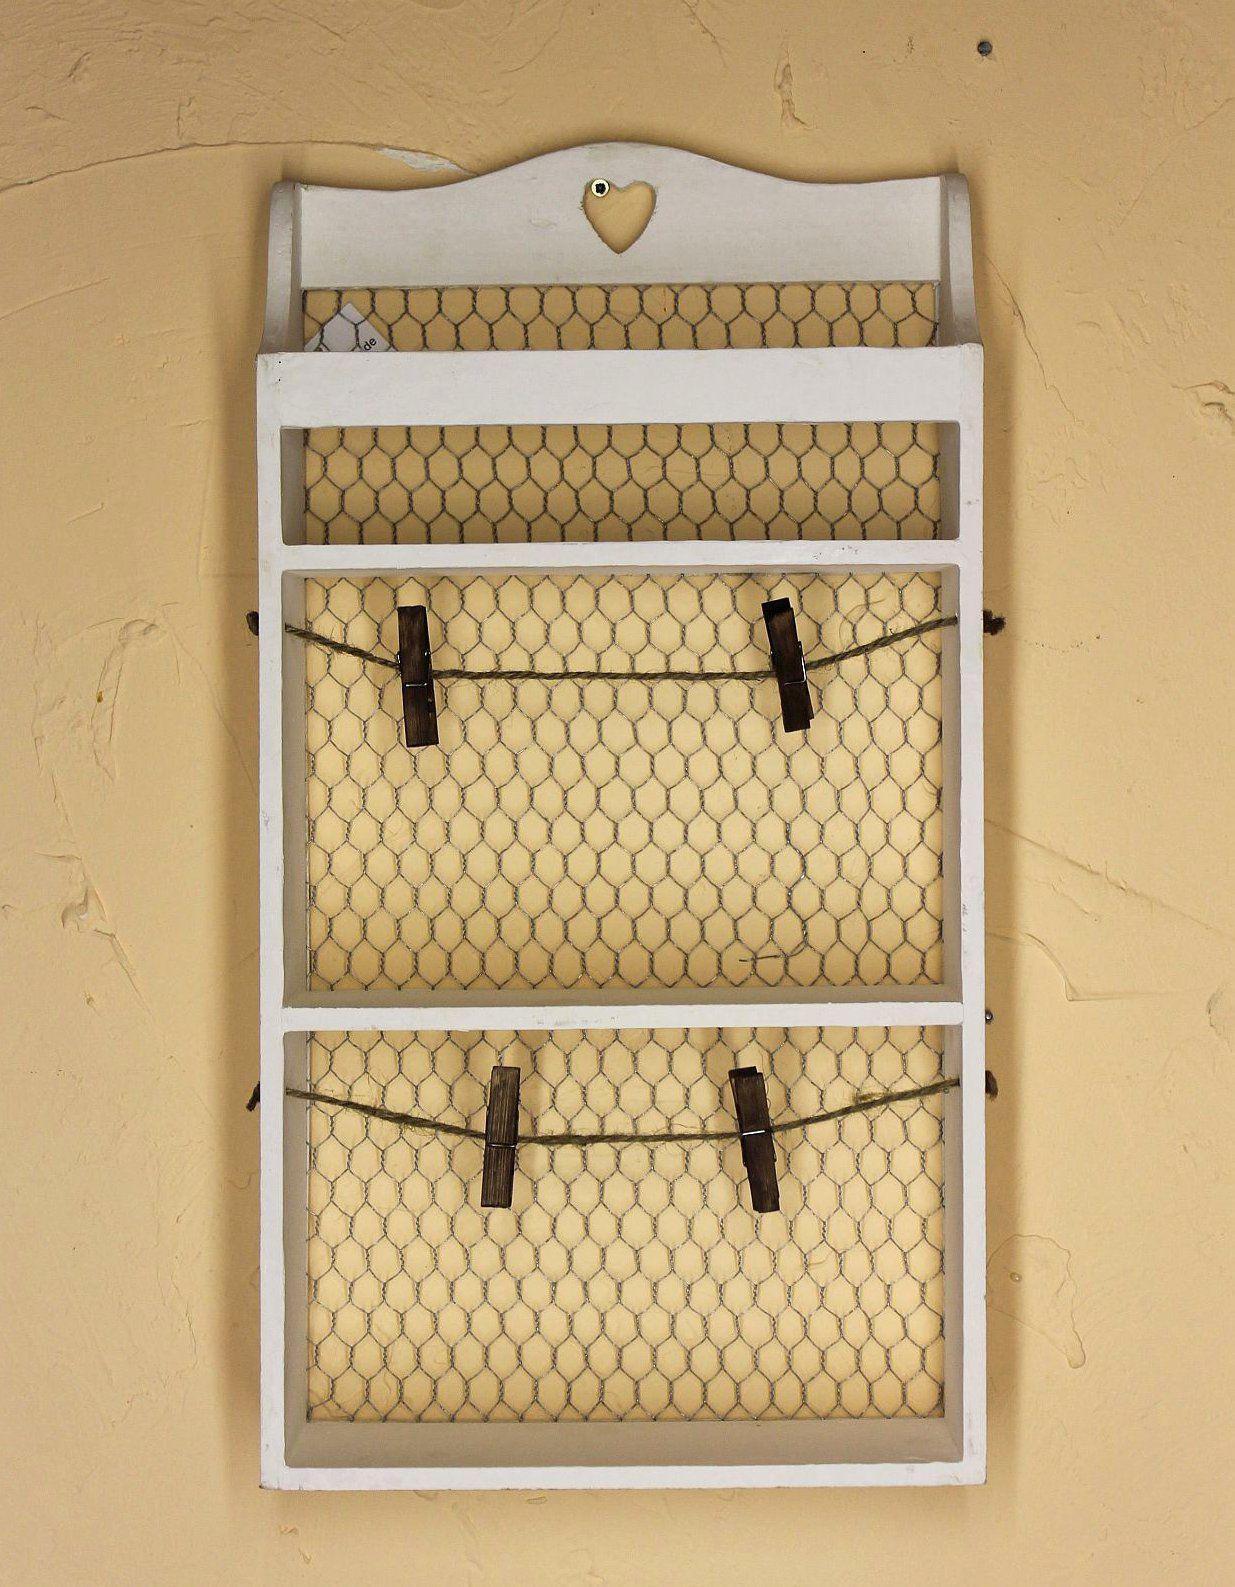 wandregal mit herz 12043 regal 57 cm vintage shabby landhaus k chenregal wei 4019110120436 ebay. Black Bedroom Furniture Sets. Home Design Ideas